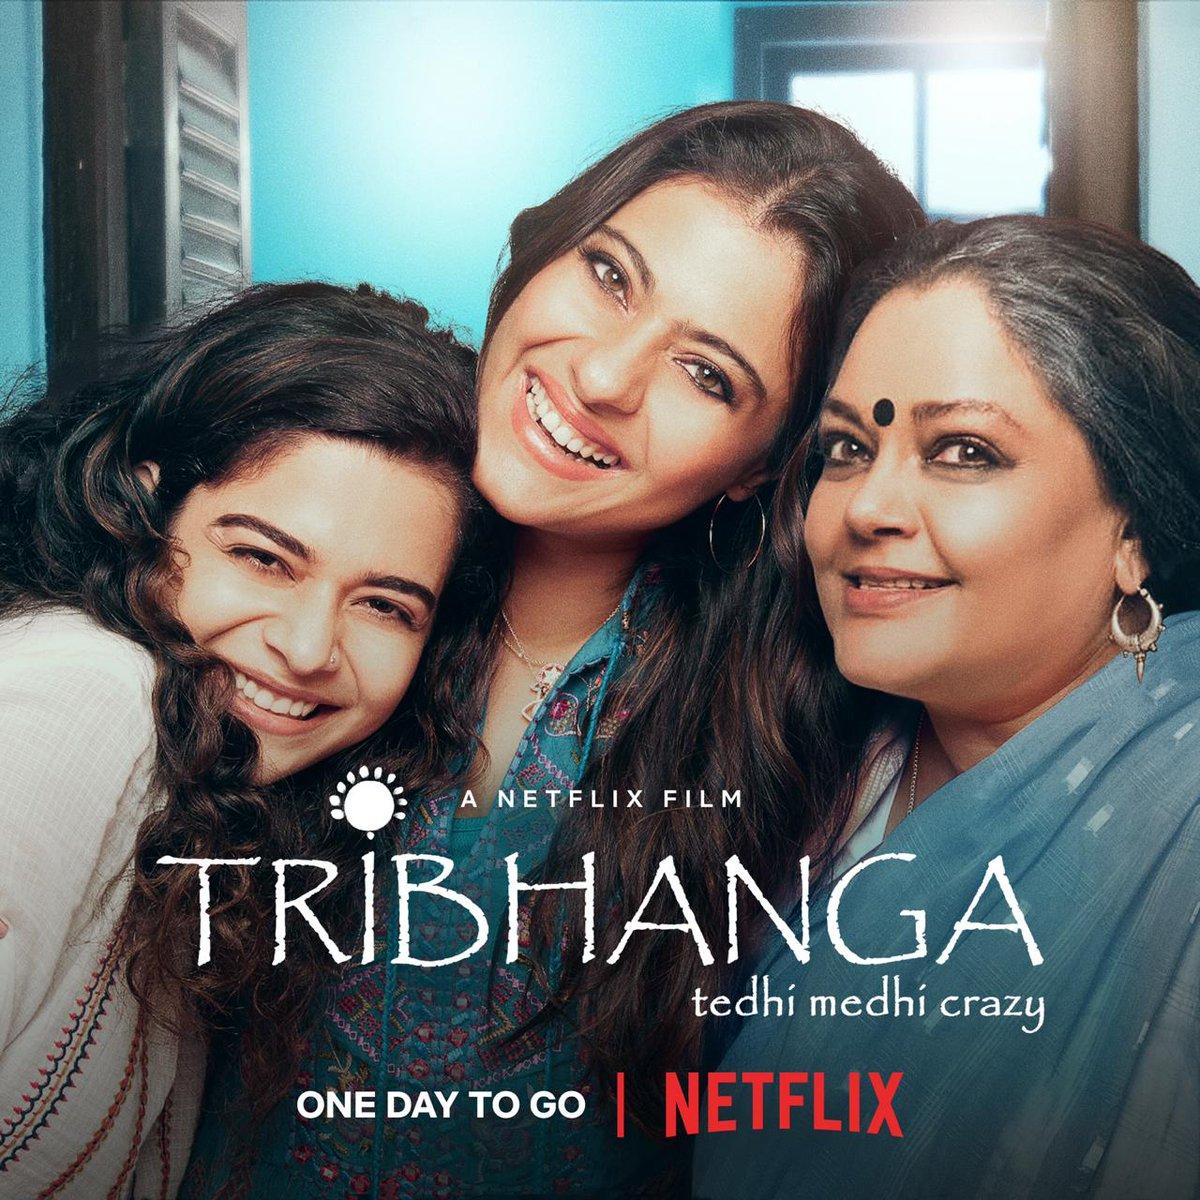 Iss baar popcorn ke saath nahi, besan ke laddoo ke saath movie dekhungi! 👻 #Tribhanga, one day to go!  @ajaydevgn @ADFFilms @Banijayasia @deepak30000 @NegiR @AlchemyFilms @sidpmalhotra @ParagDesai @mipalkar @renukash @ikunaalroykapur @Meena_Iyer @KumarMangat @NetflixIndia